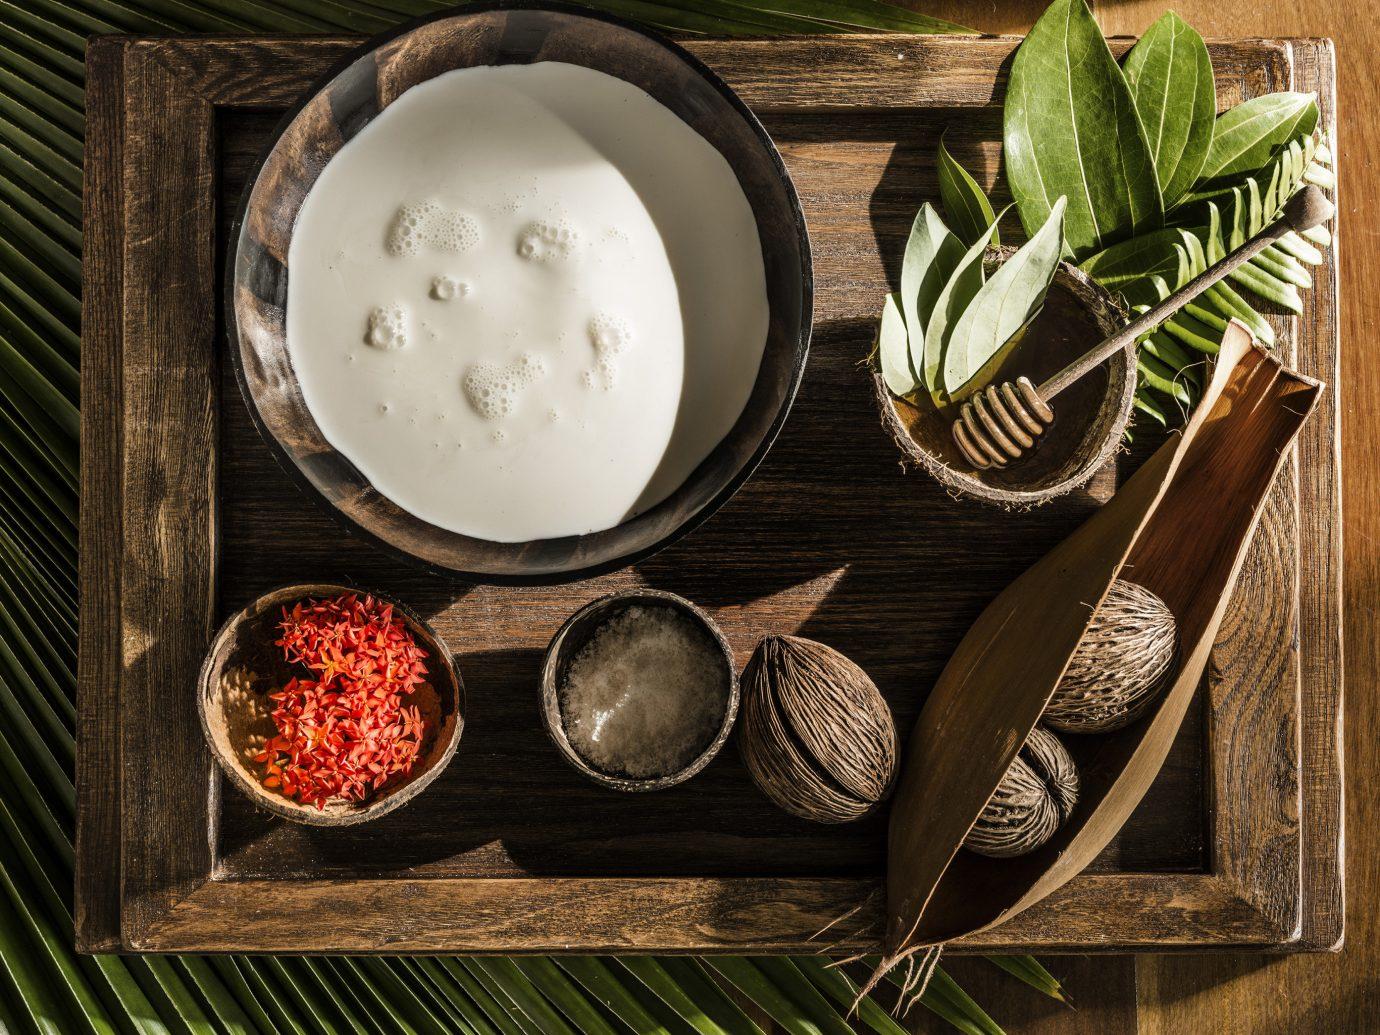 Health + Wellness Spa Retreats Travel Tips food produce flower flavor herb dish meal